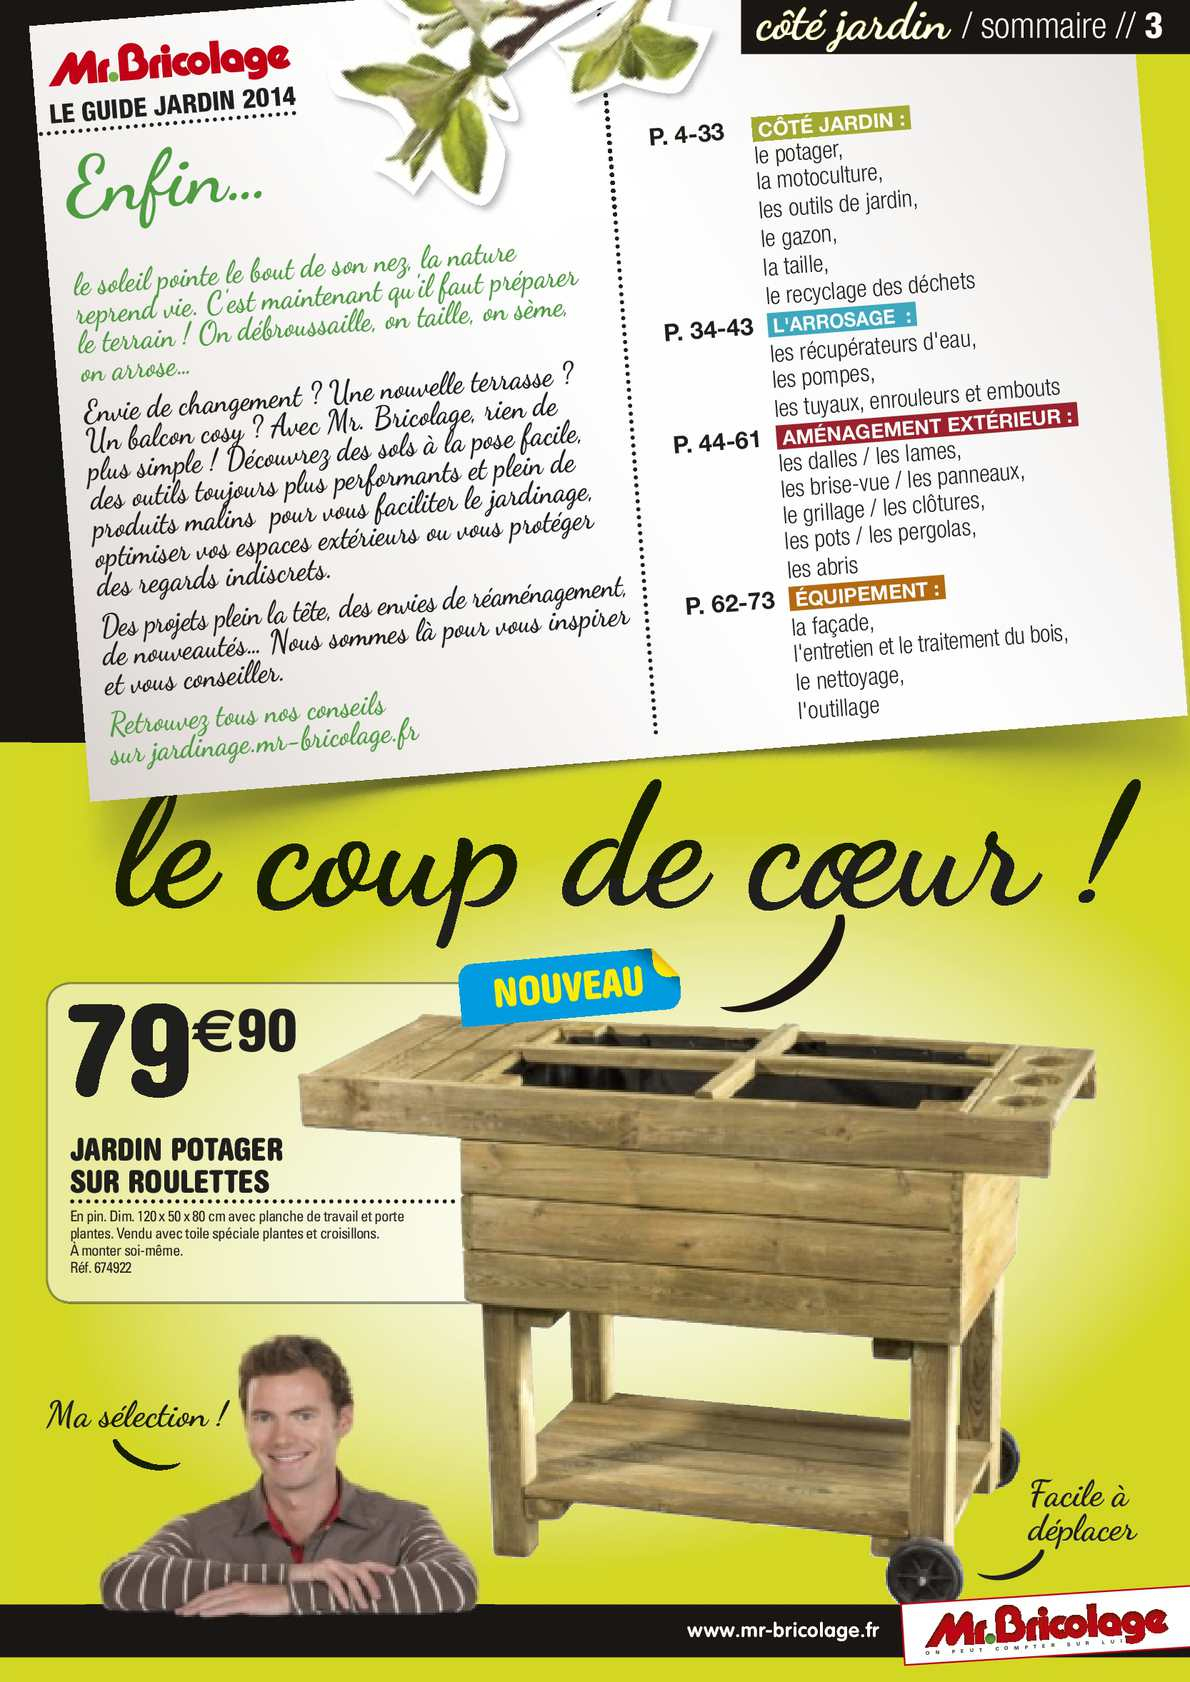 Guide Jardin 2014 Mr.bricolage - Calameo Downloader intérieur Croisillon Jardin